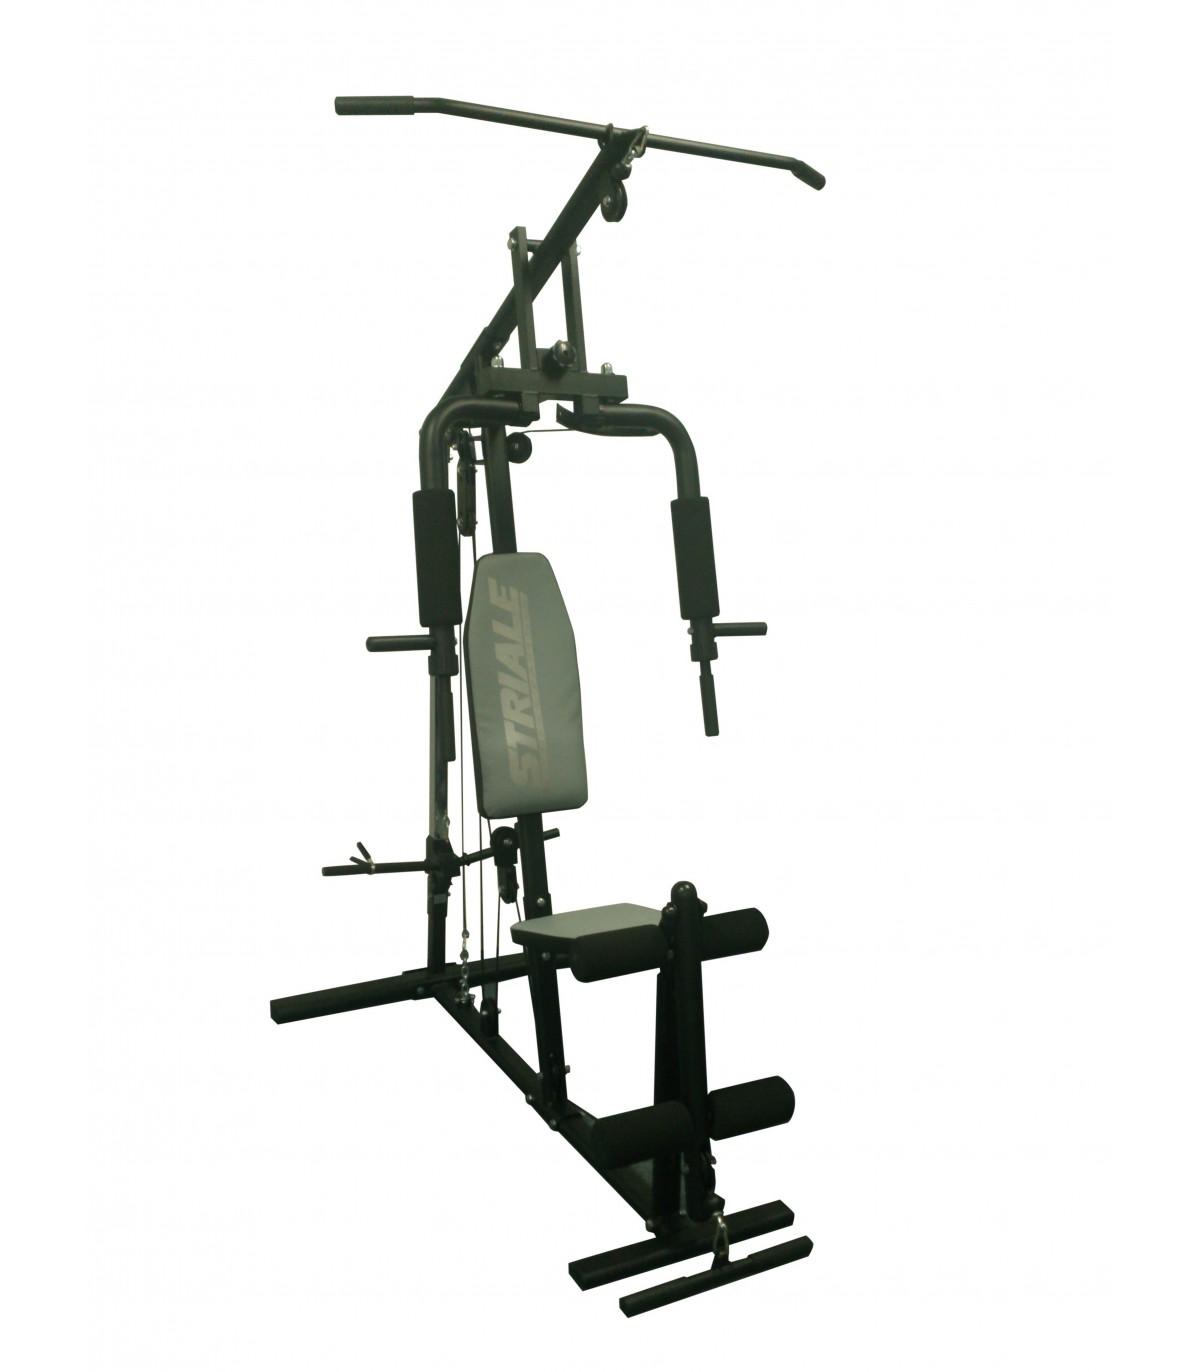 Presse De Musculation Multi Fonctions Sh 6000 Care Fitness